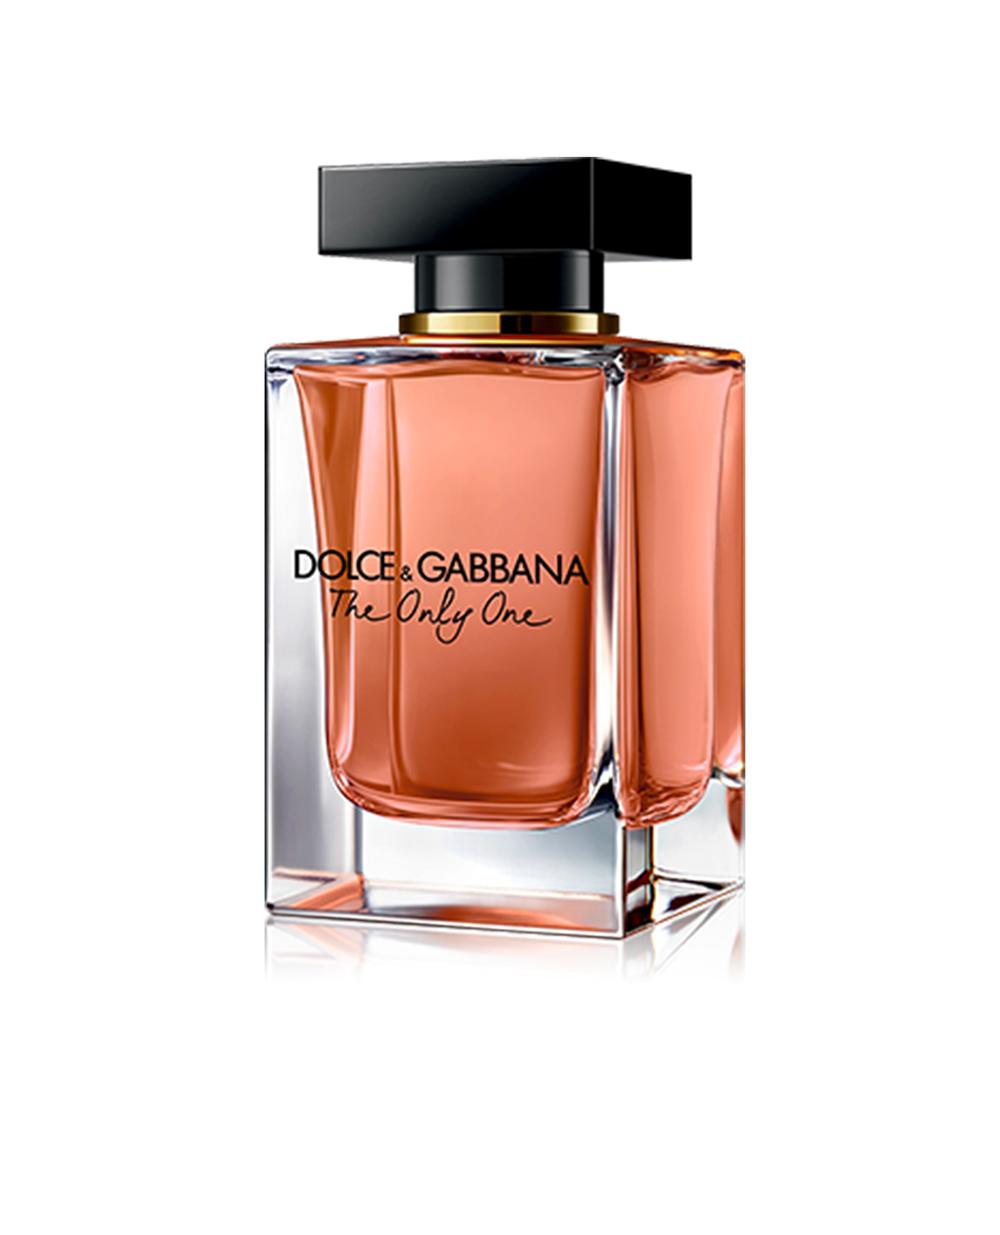 Парфюмированная вода The Only One, 30 мл Dolce&Gabbana 84524500000ЗЕОНЛИВАН — Kameron